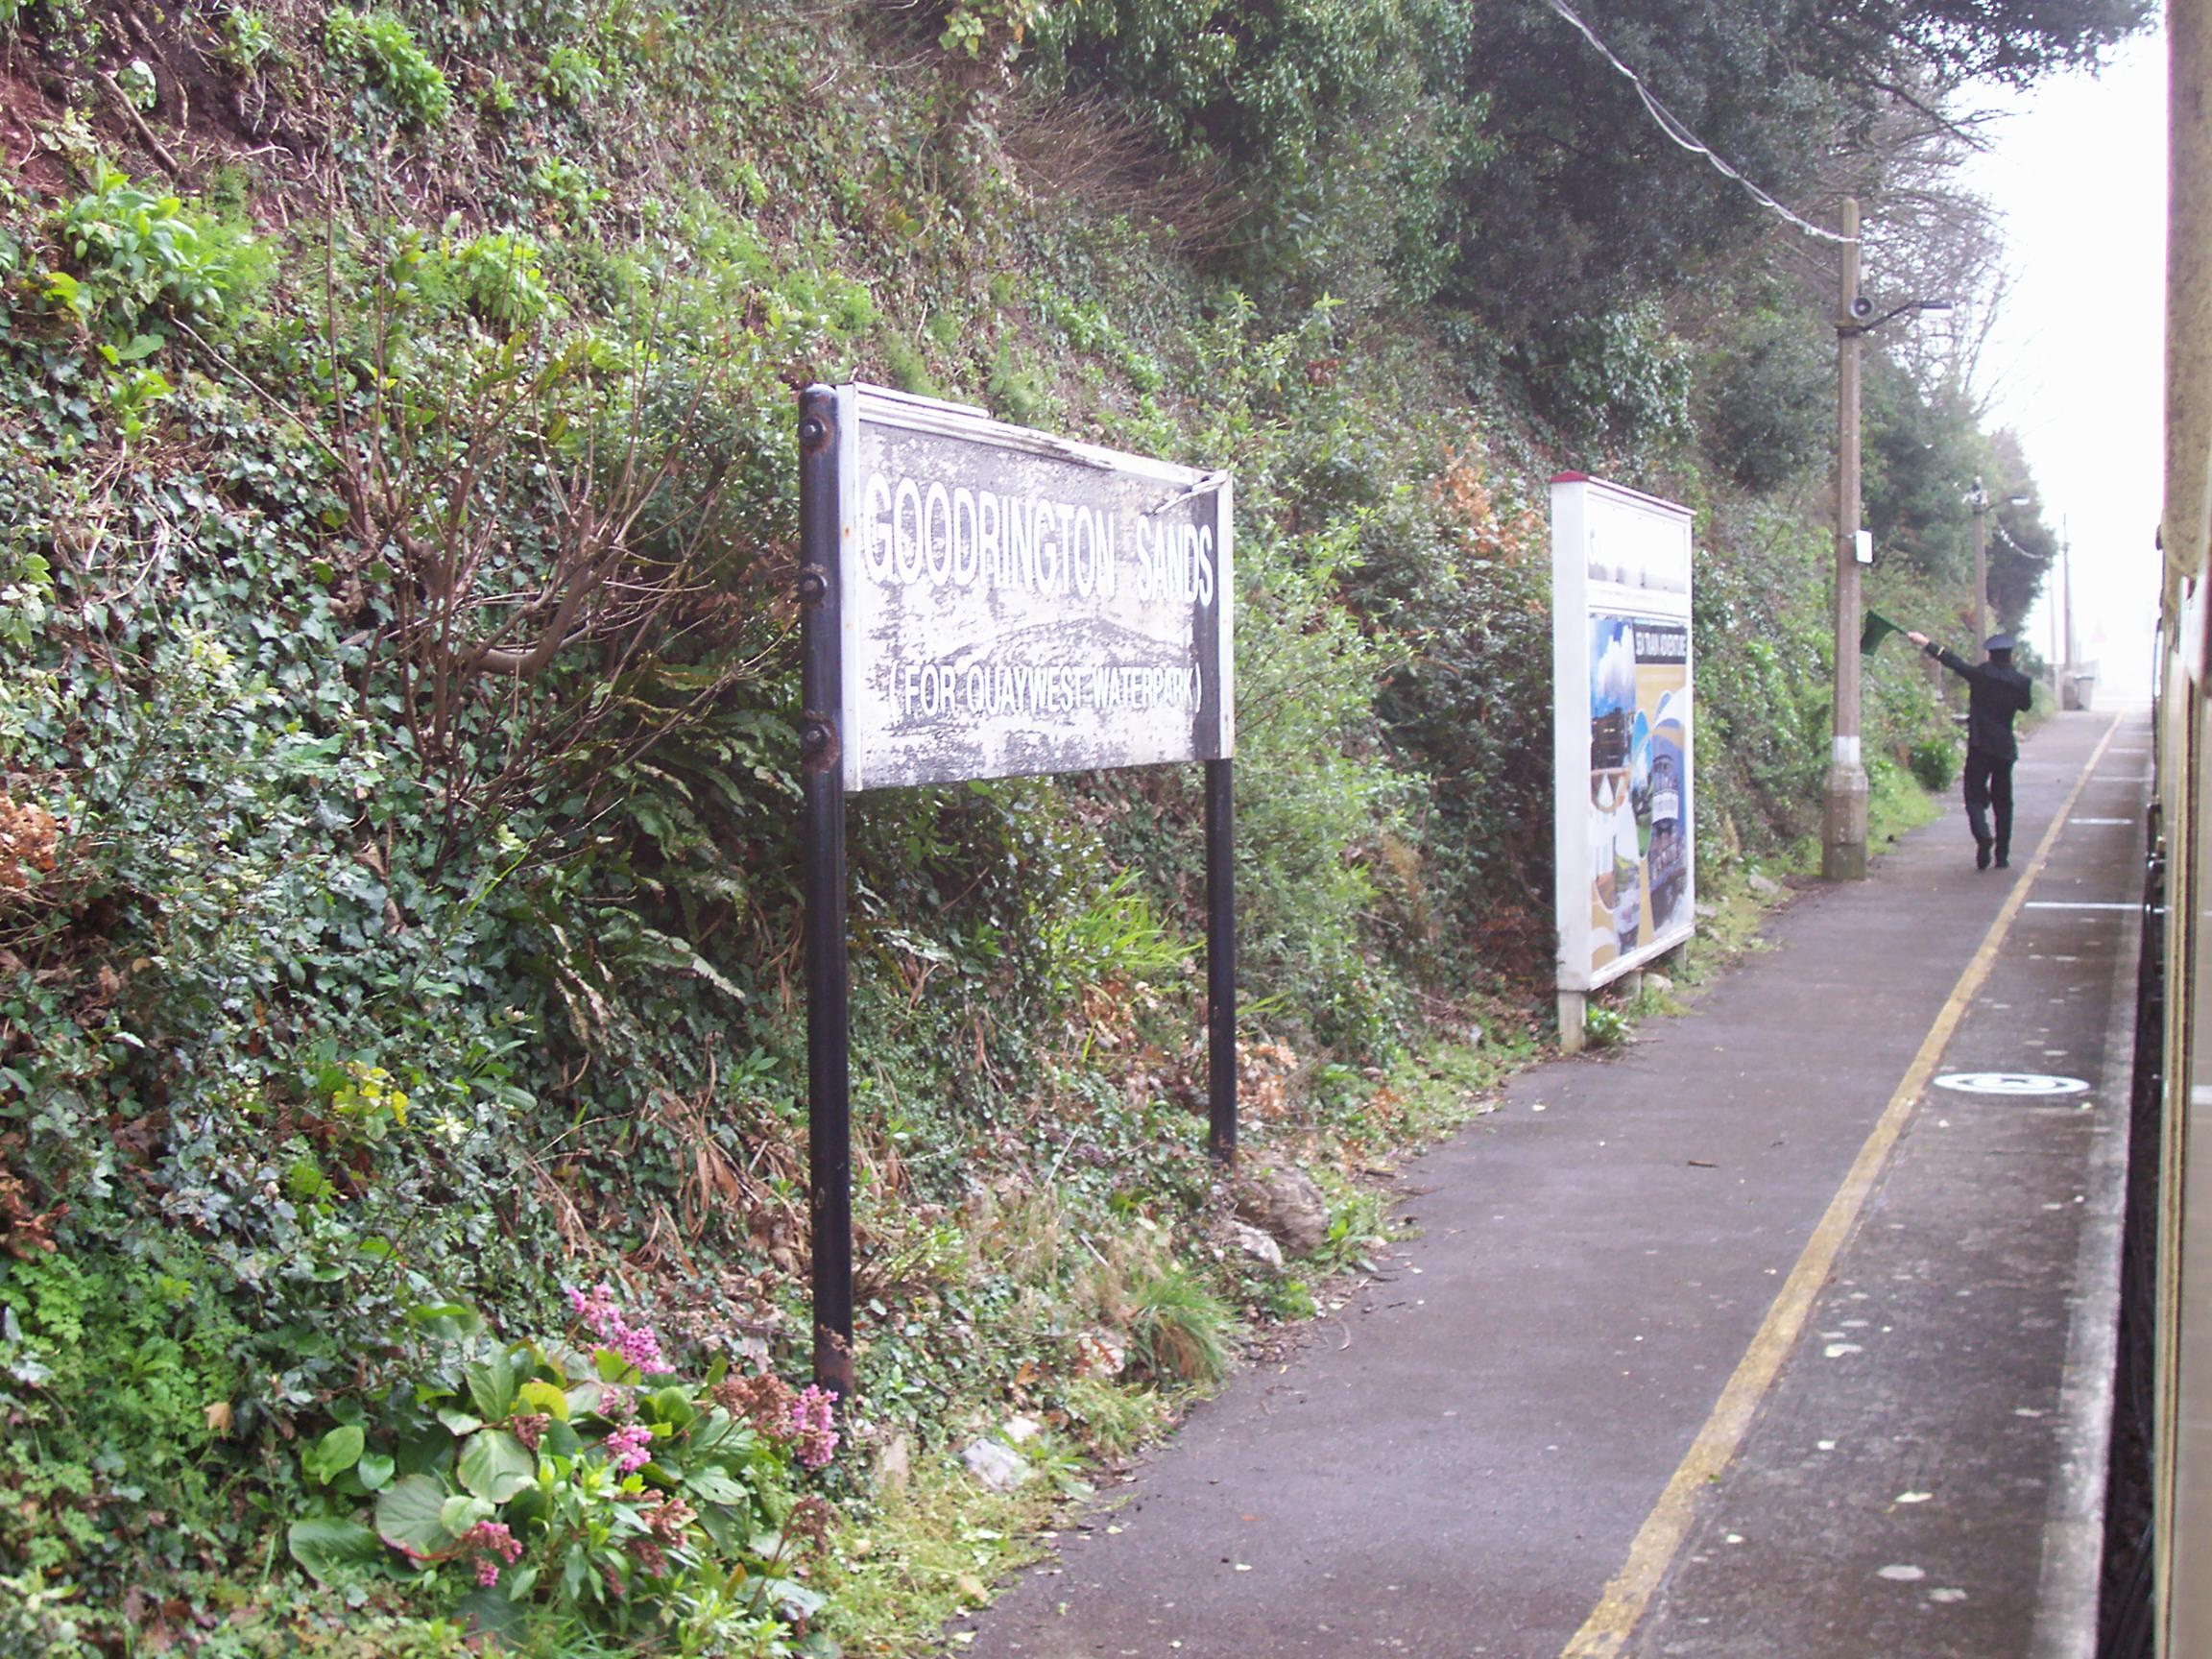 Goodrington Sands Halt